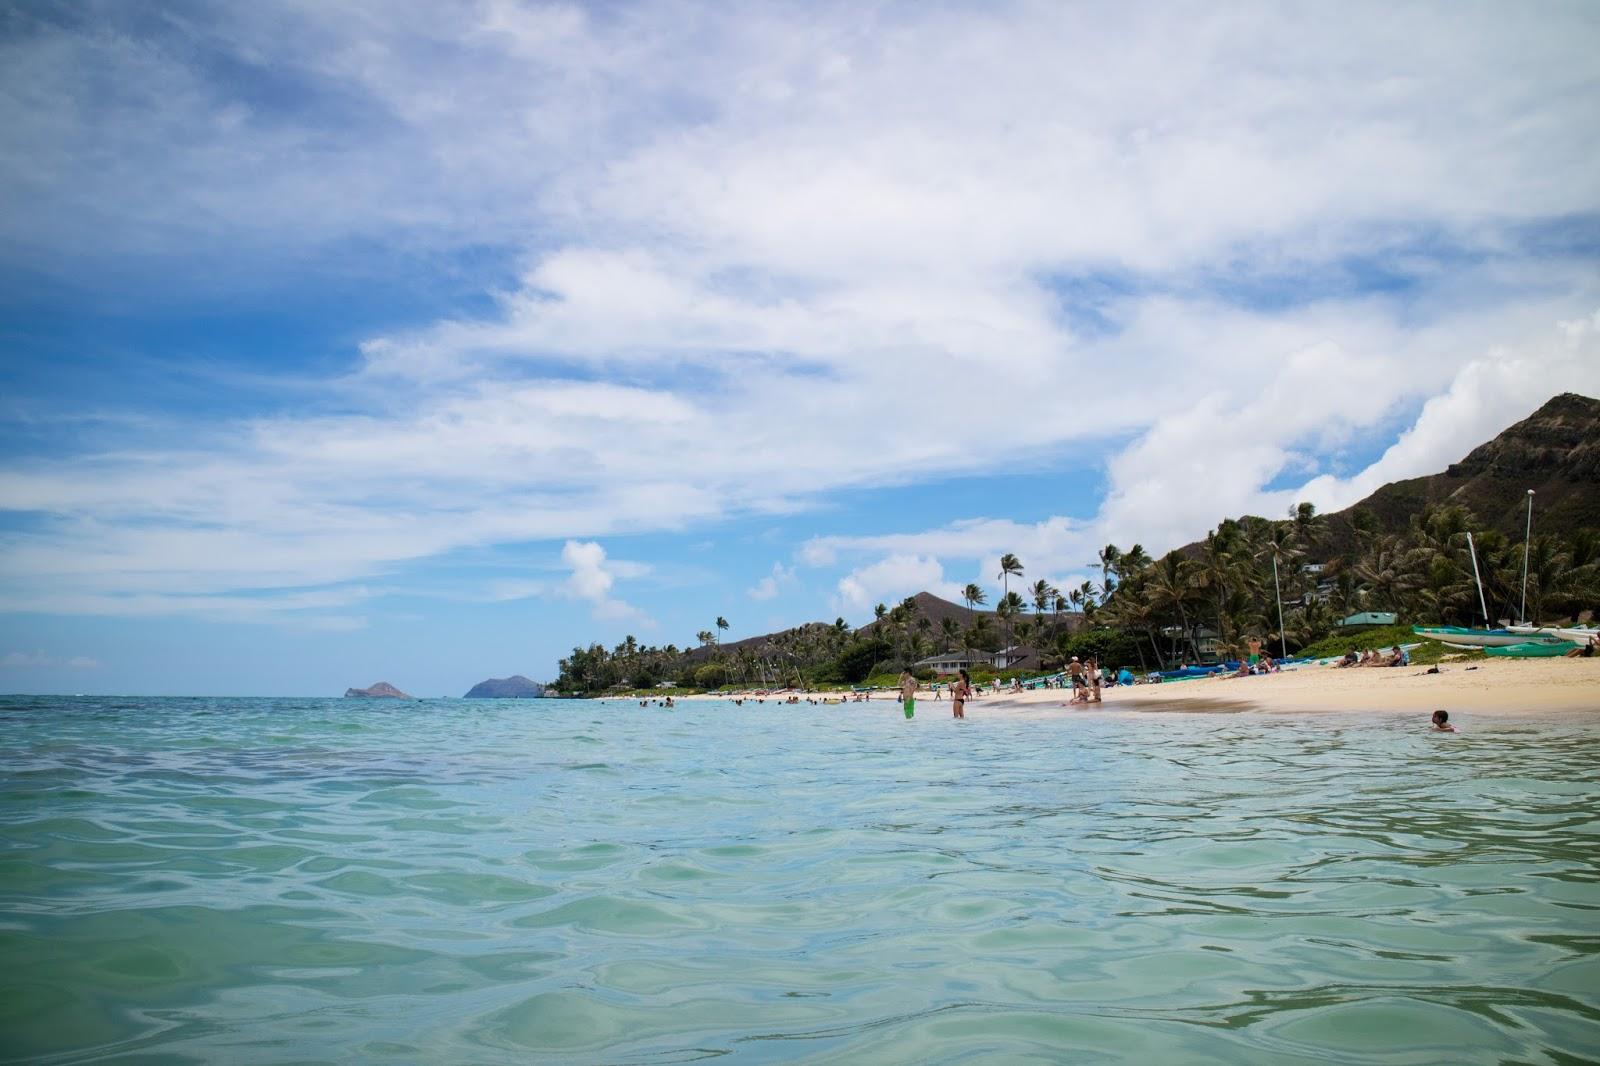 Lanai Beach, Oahu, Hawaii